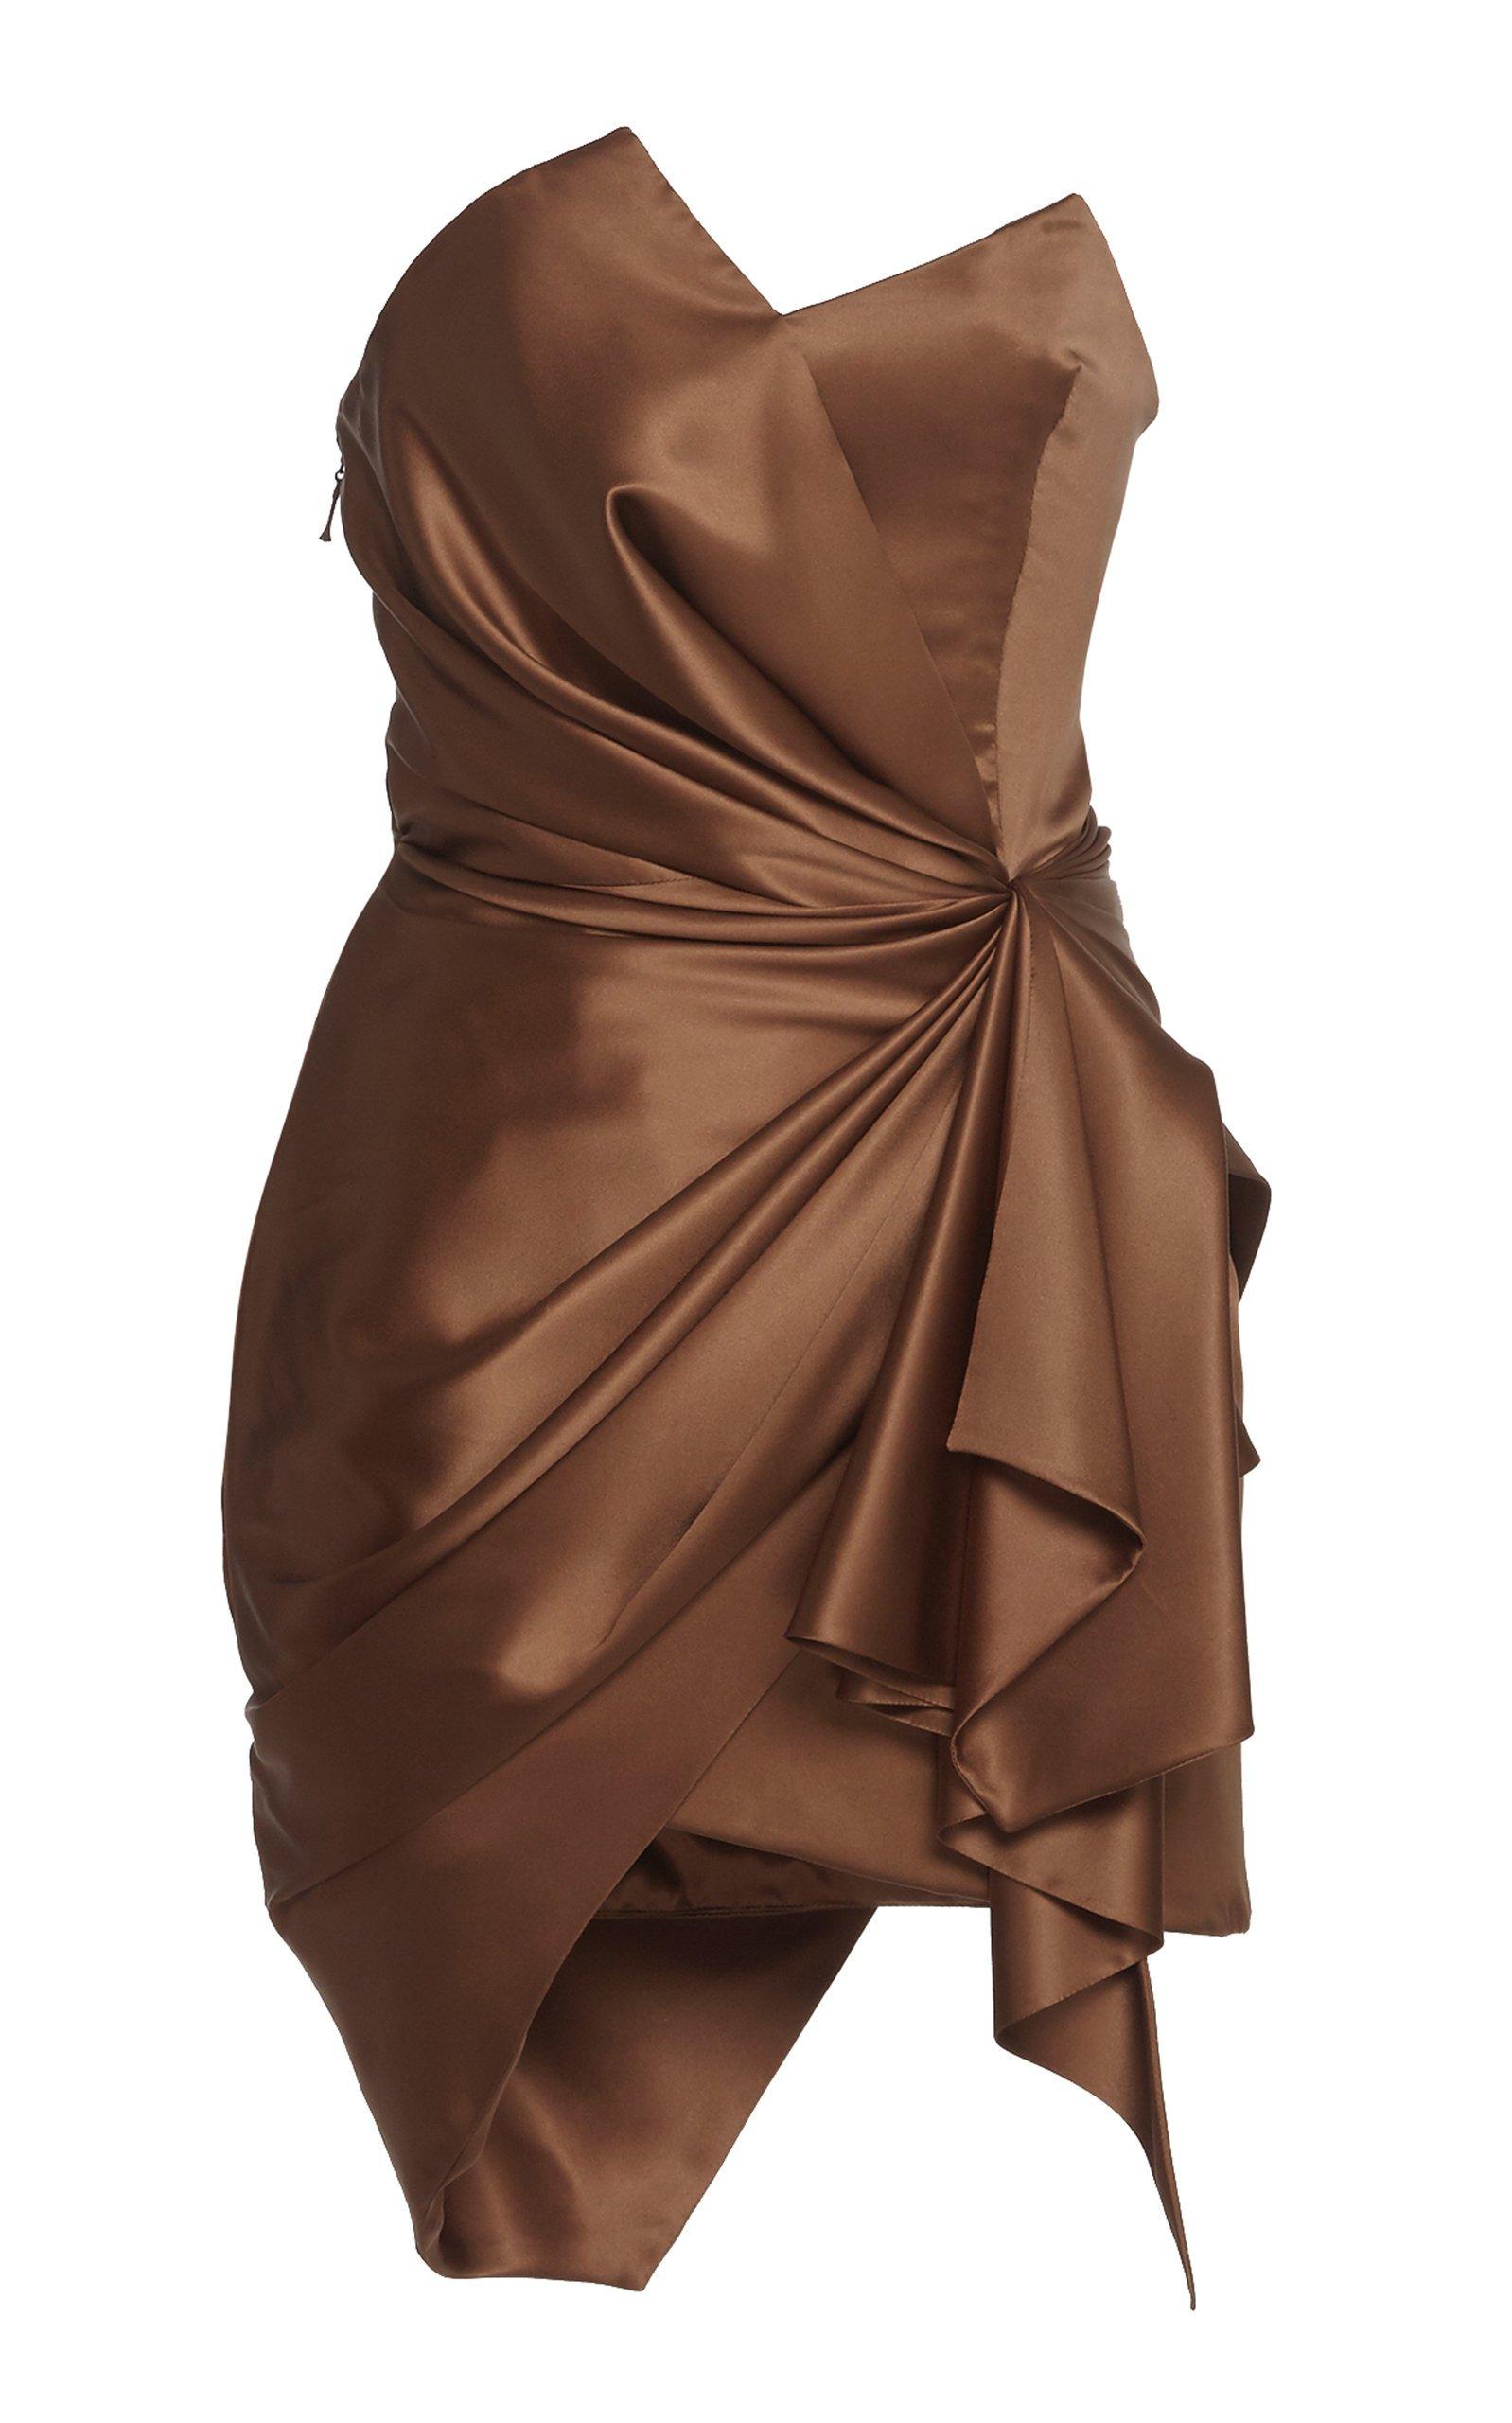 large_alexandre-vauthier-brown-strapless-satin-dress.jpg (1598×2560)